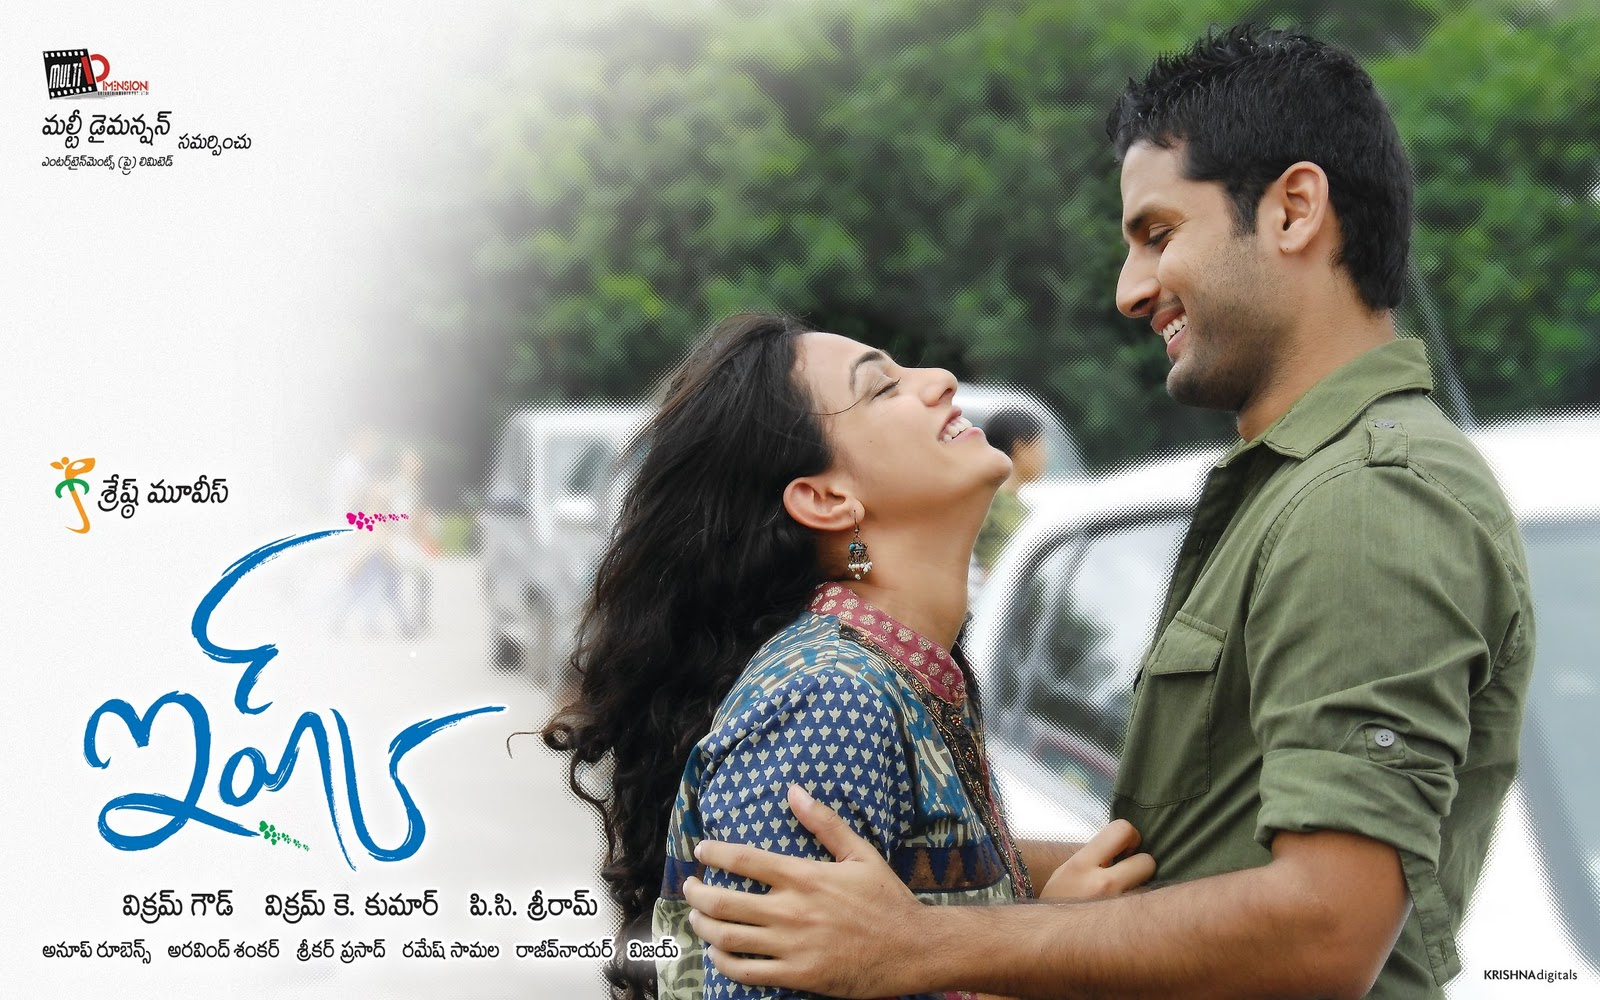 Sambaram Movie Songs Telugu Spanish Films Online With English